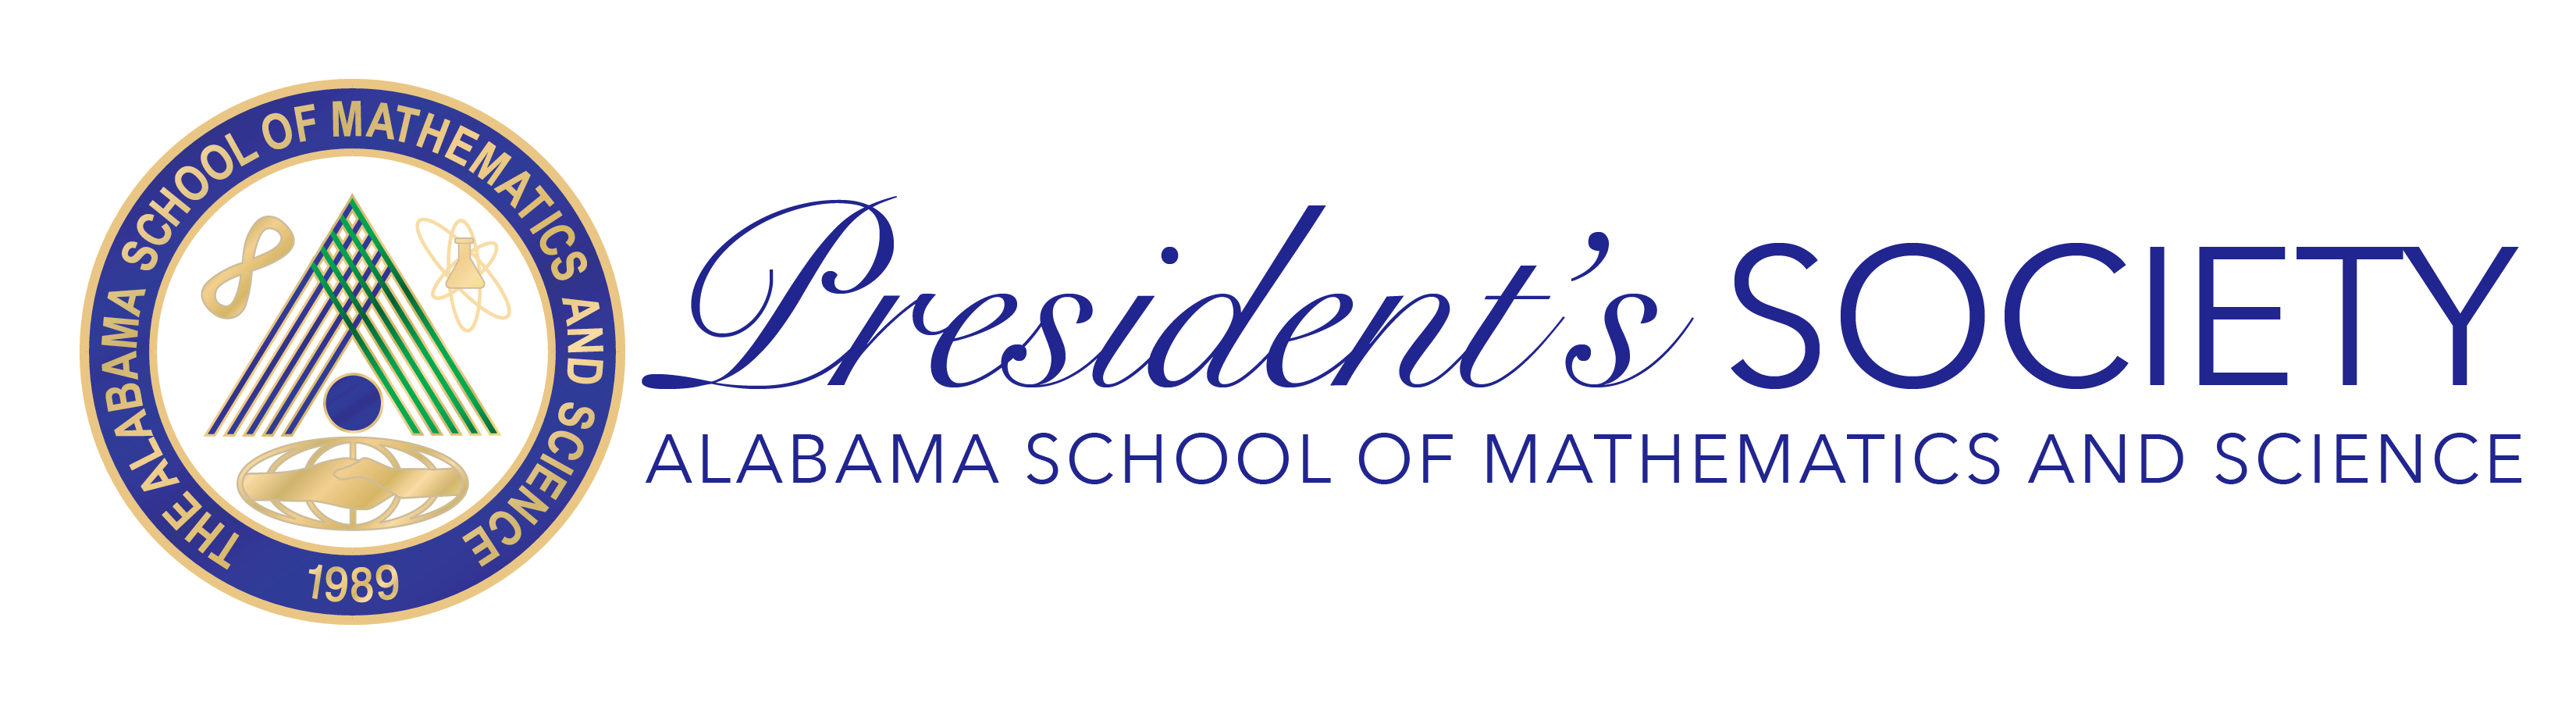 Society Logos 1989 and President2